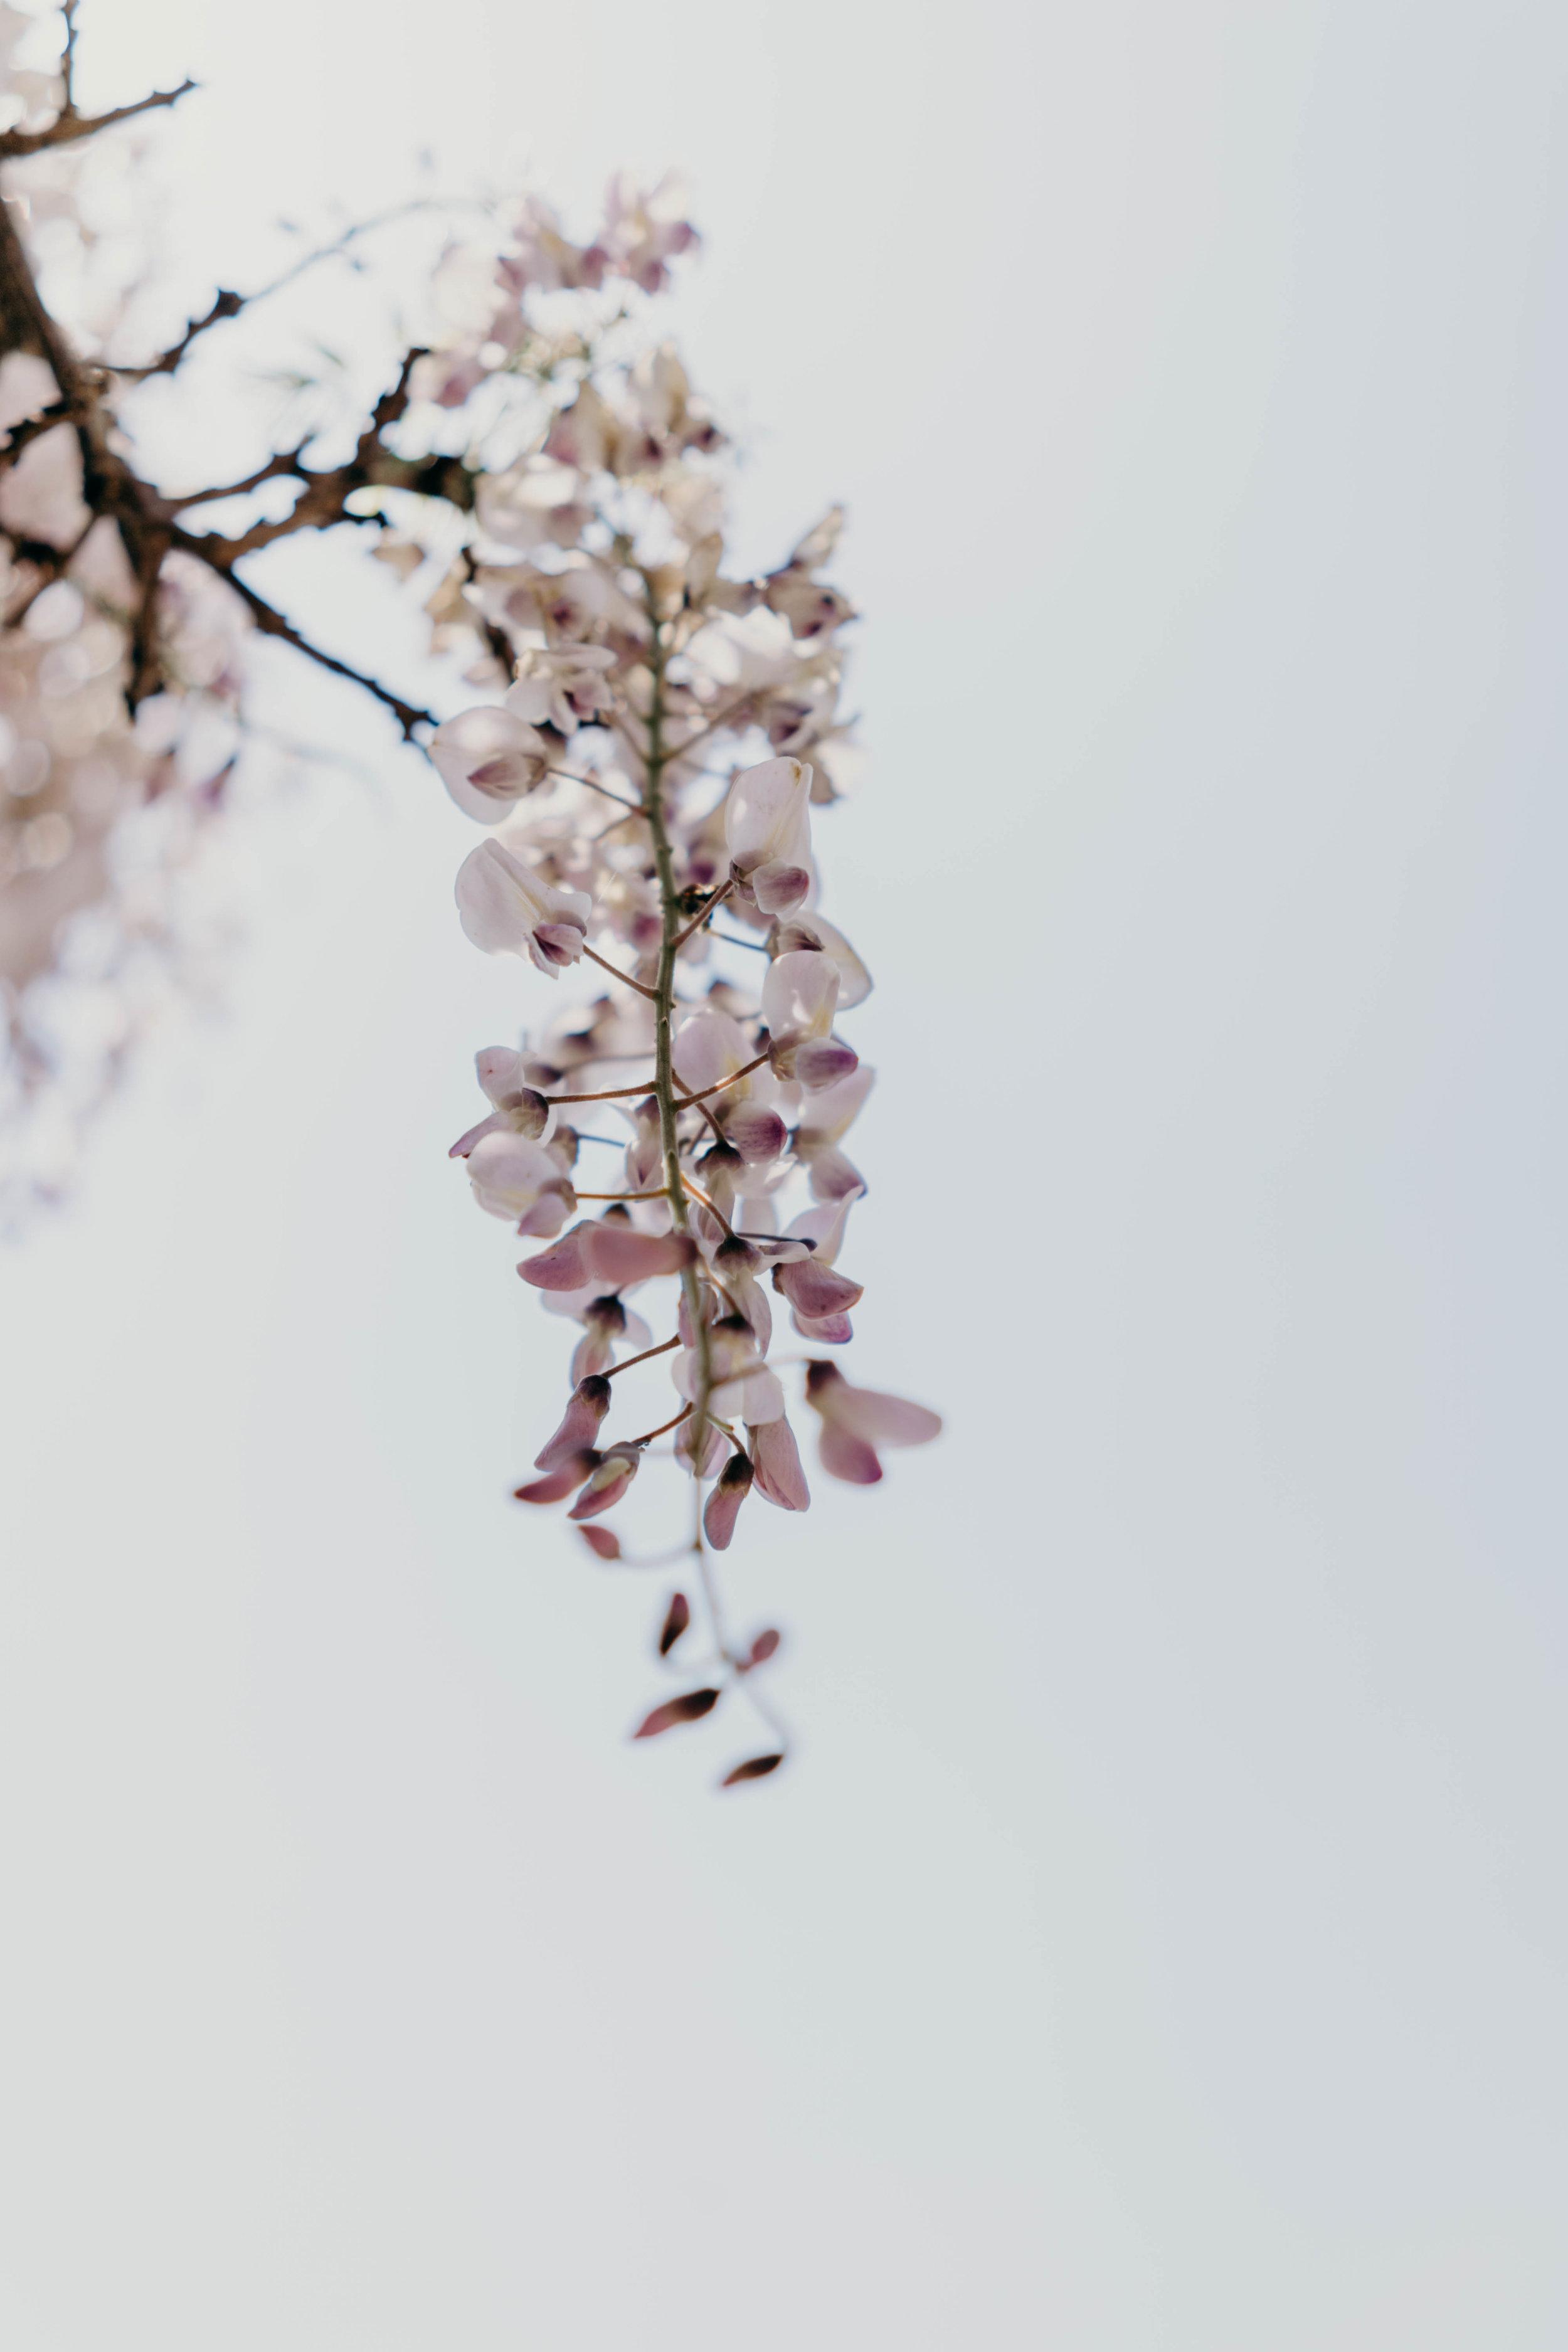 Kawachi Fuji Wisteria Garden, Kitakyushu | On the Street Where We Live ( aretherelilactrees.com )  Kawachi Fuji Garden, wisteria, wisteria garden, Kitakyushu, Japan